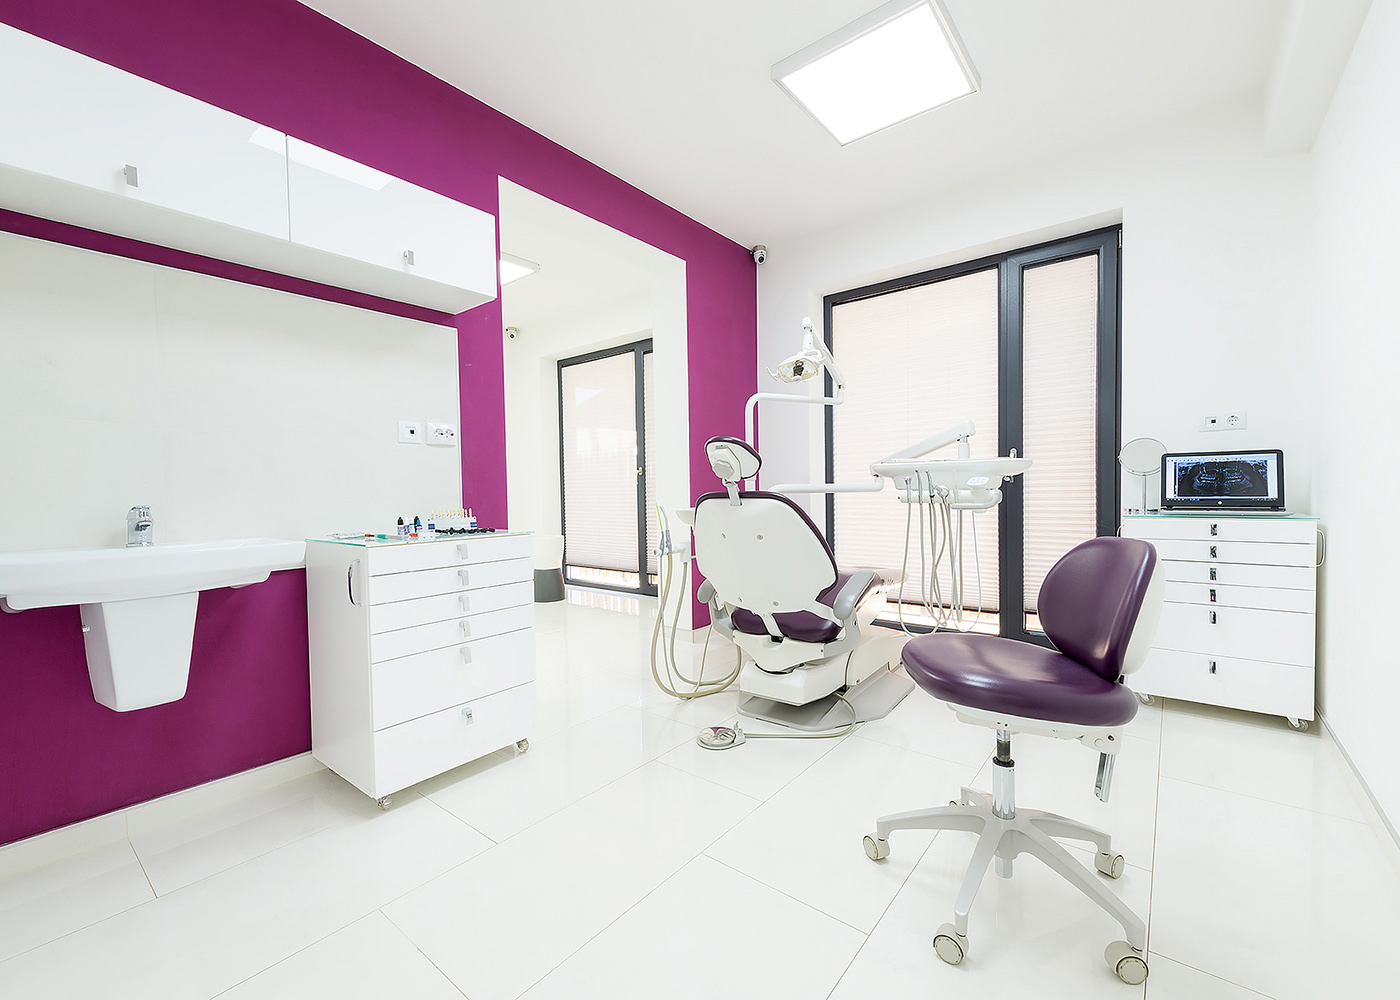 Fotografiede de arhitectura interioara clinica stomatologica Bec